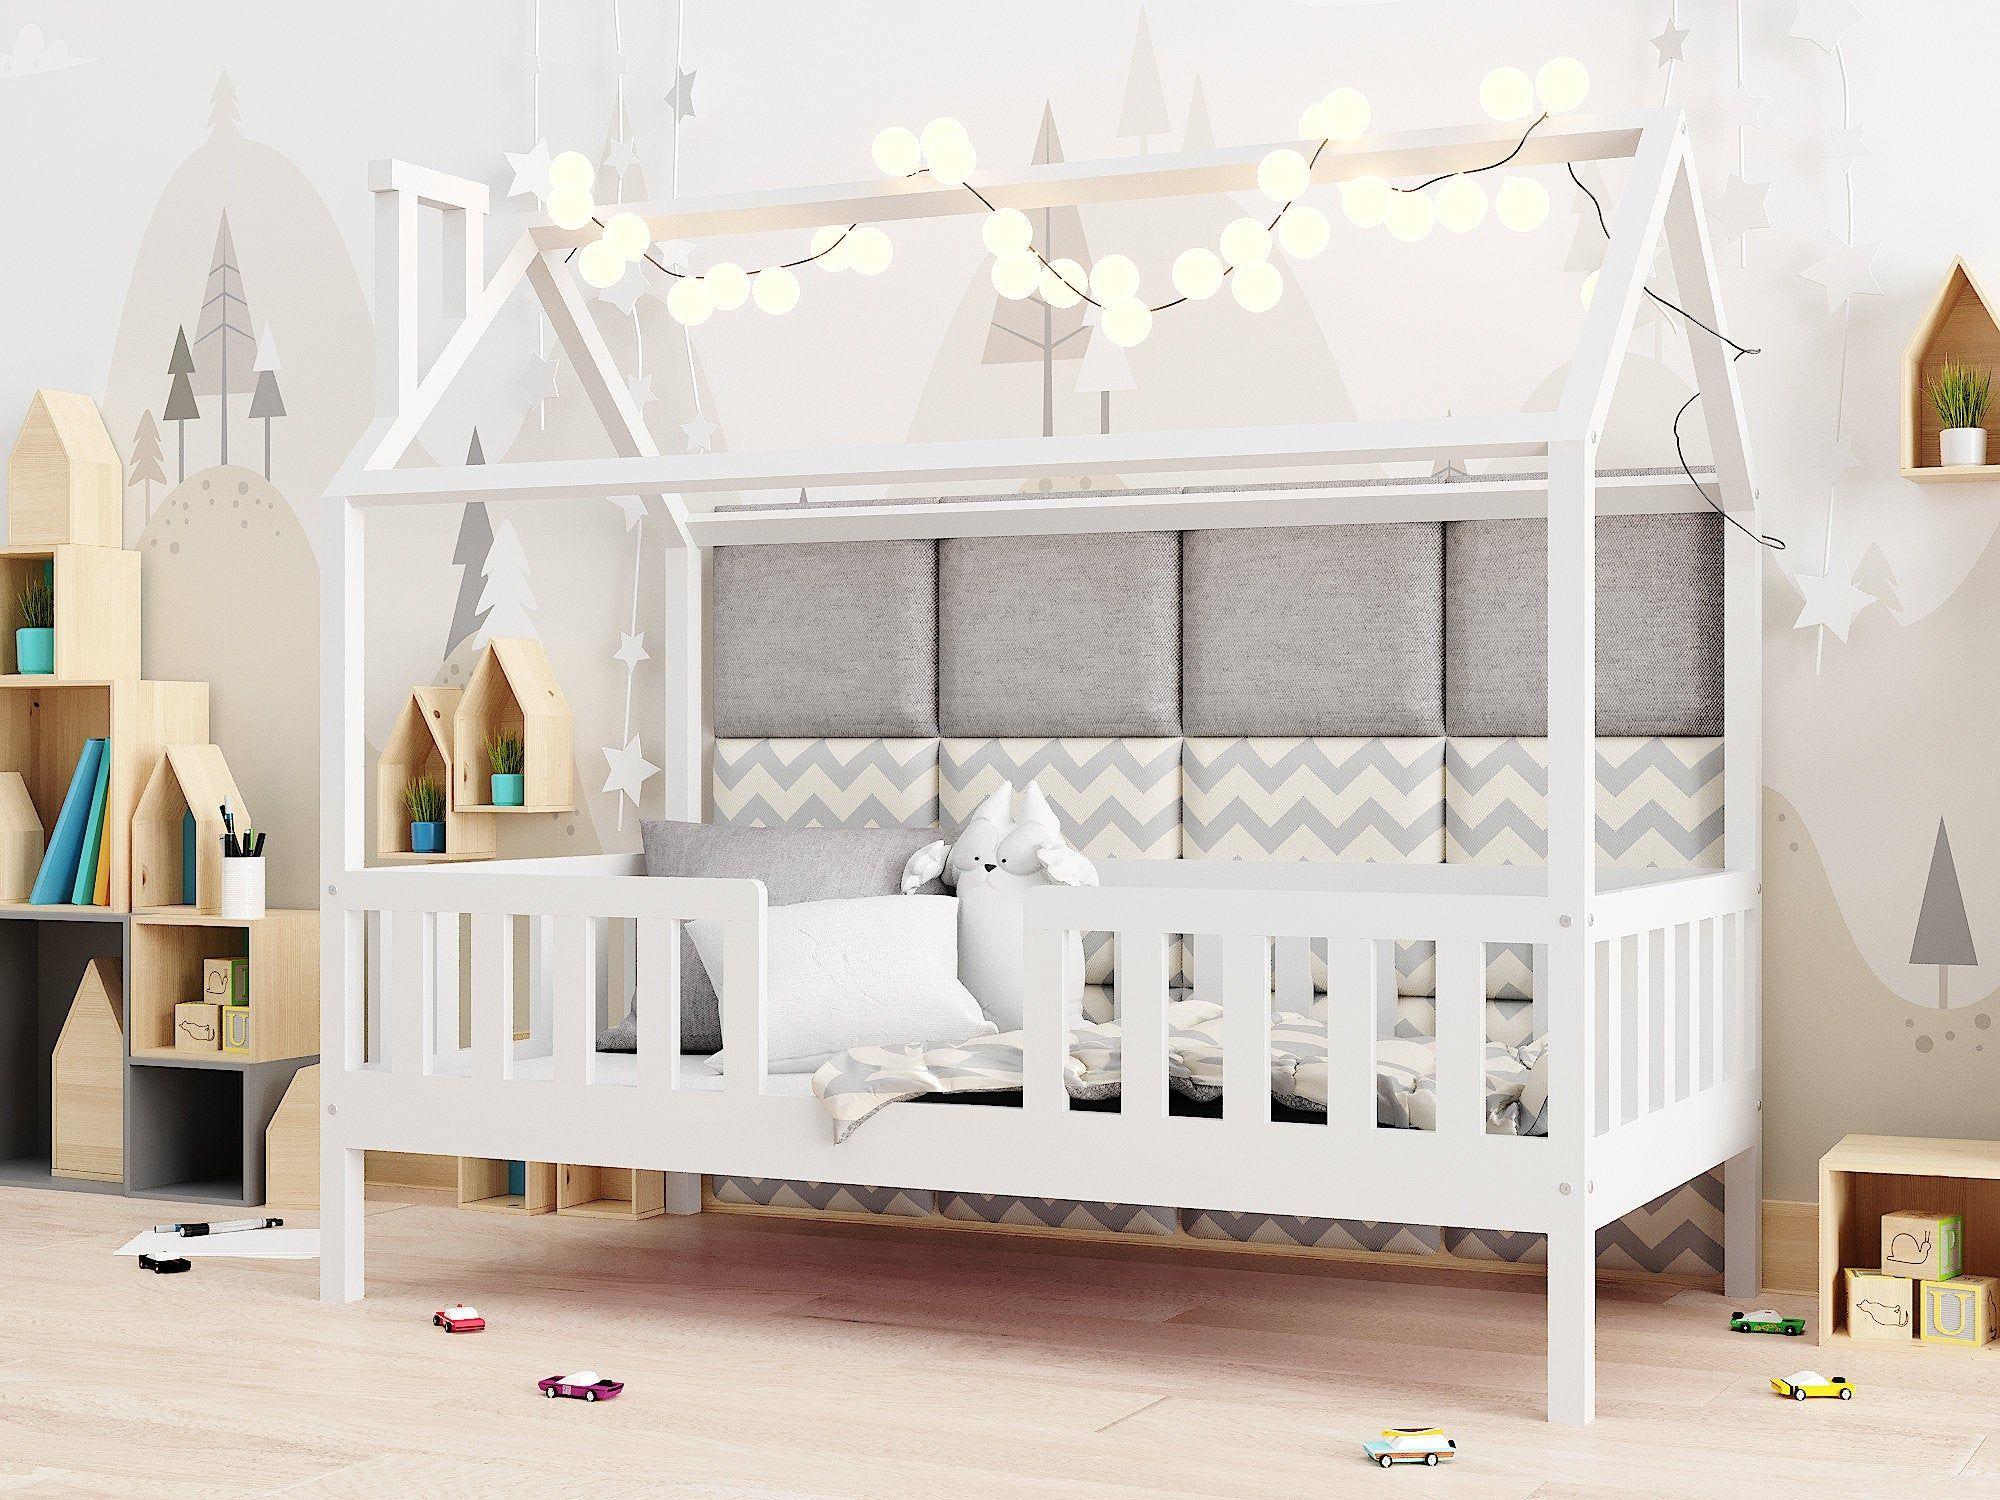 Kinderbetreuung Haus Kinderbett Haus Rausfallschutz Kinderbett Kinderbett